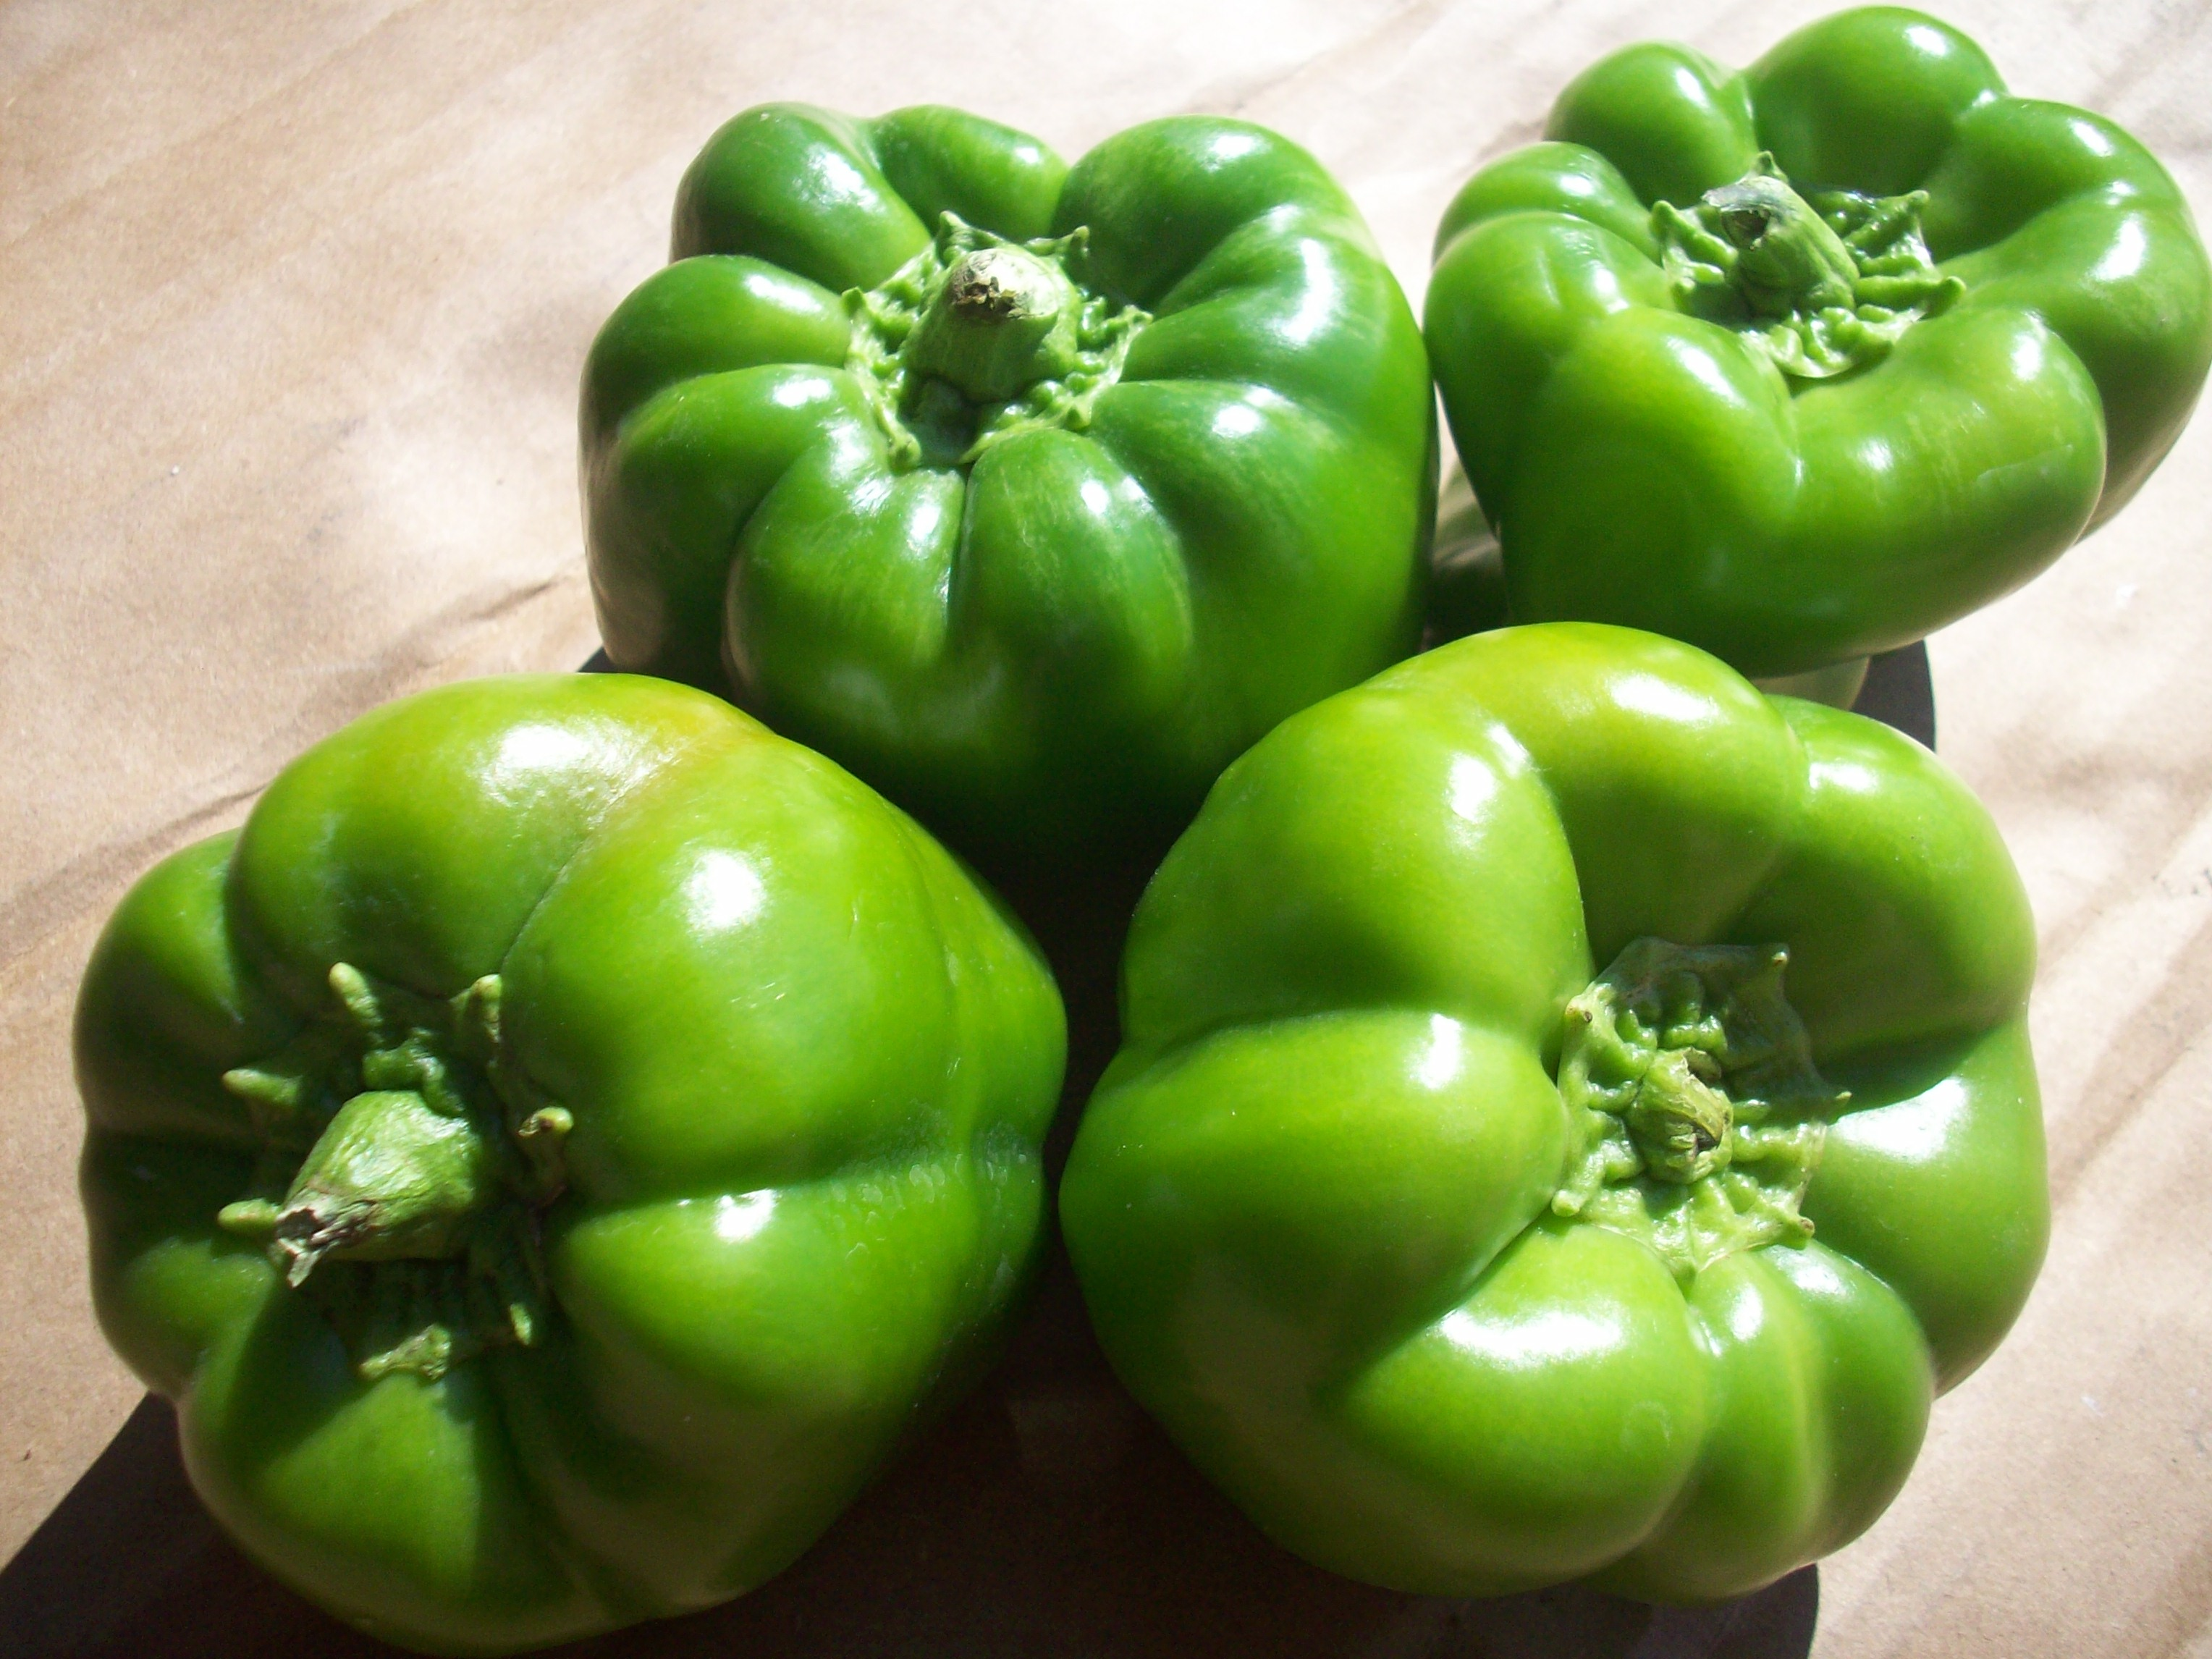 Boston Organics - Green Bell Peppers